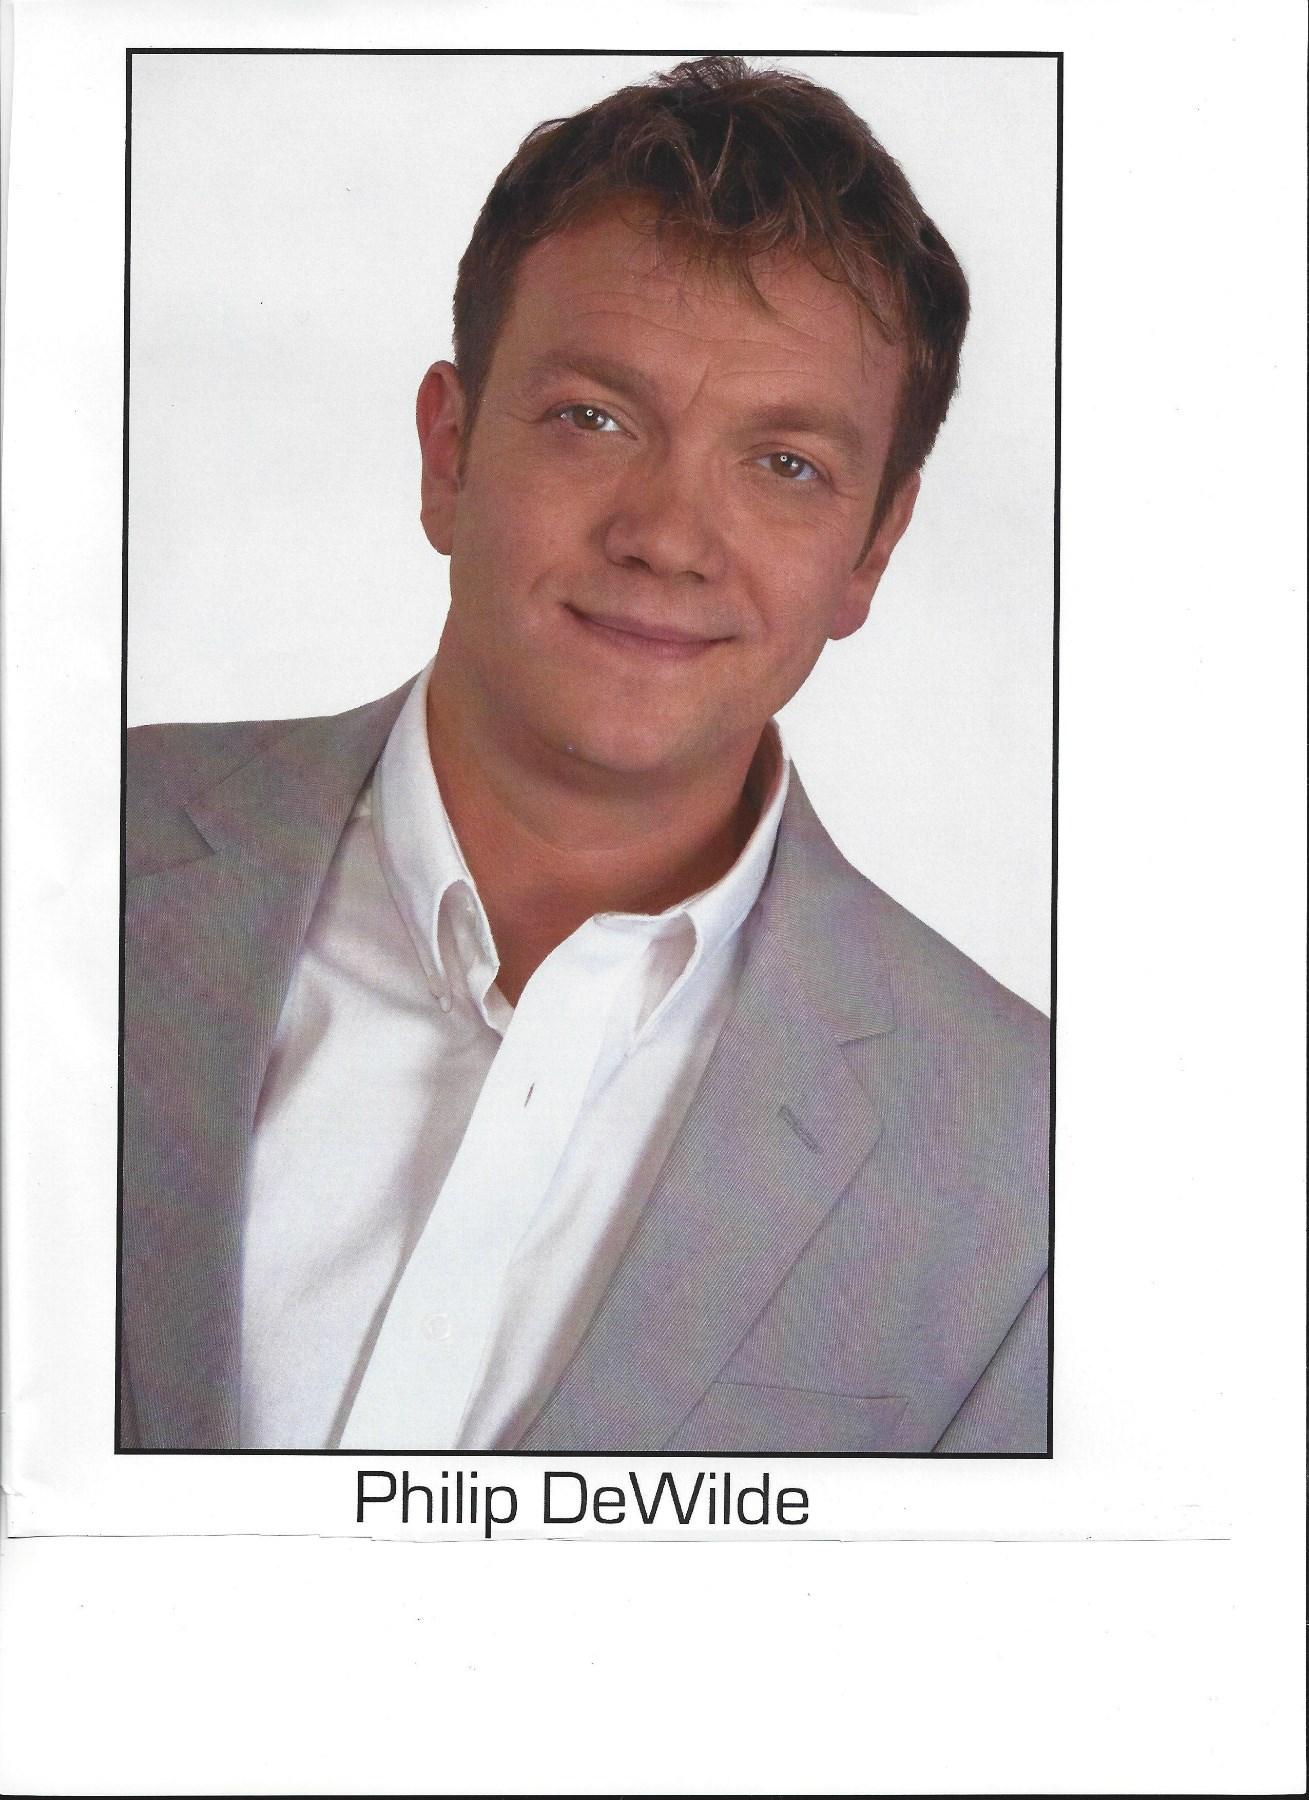 Philip DeWilde